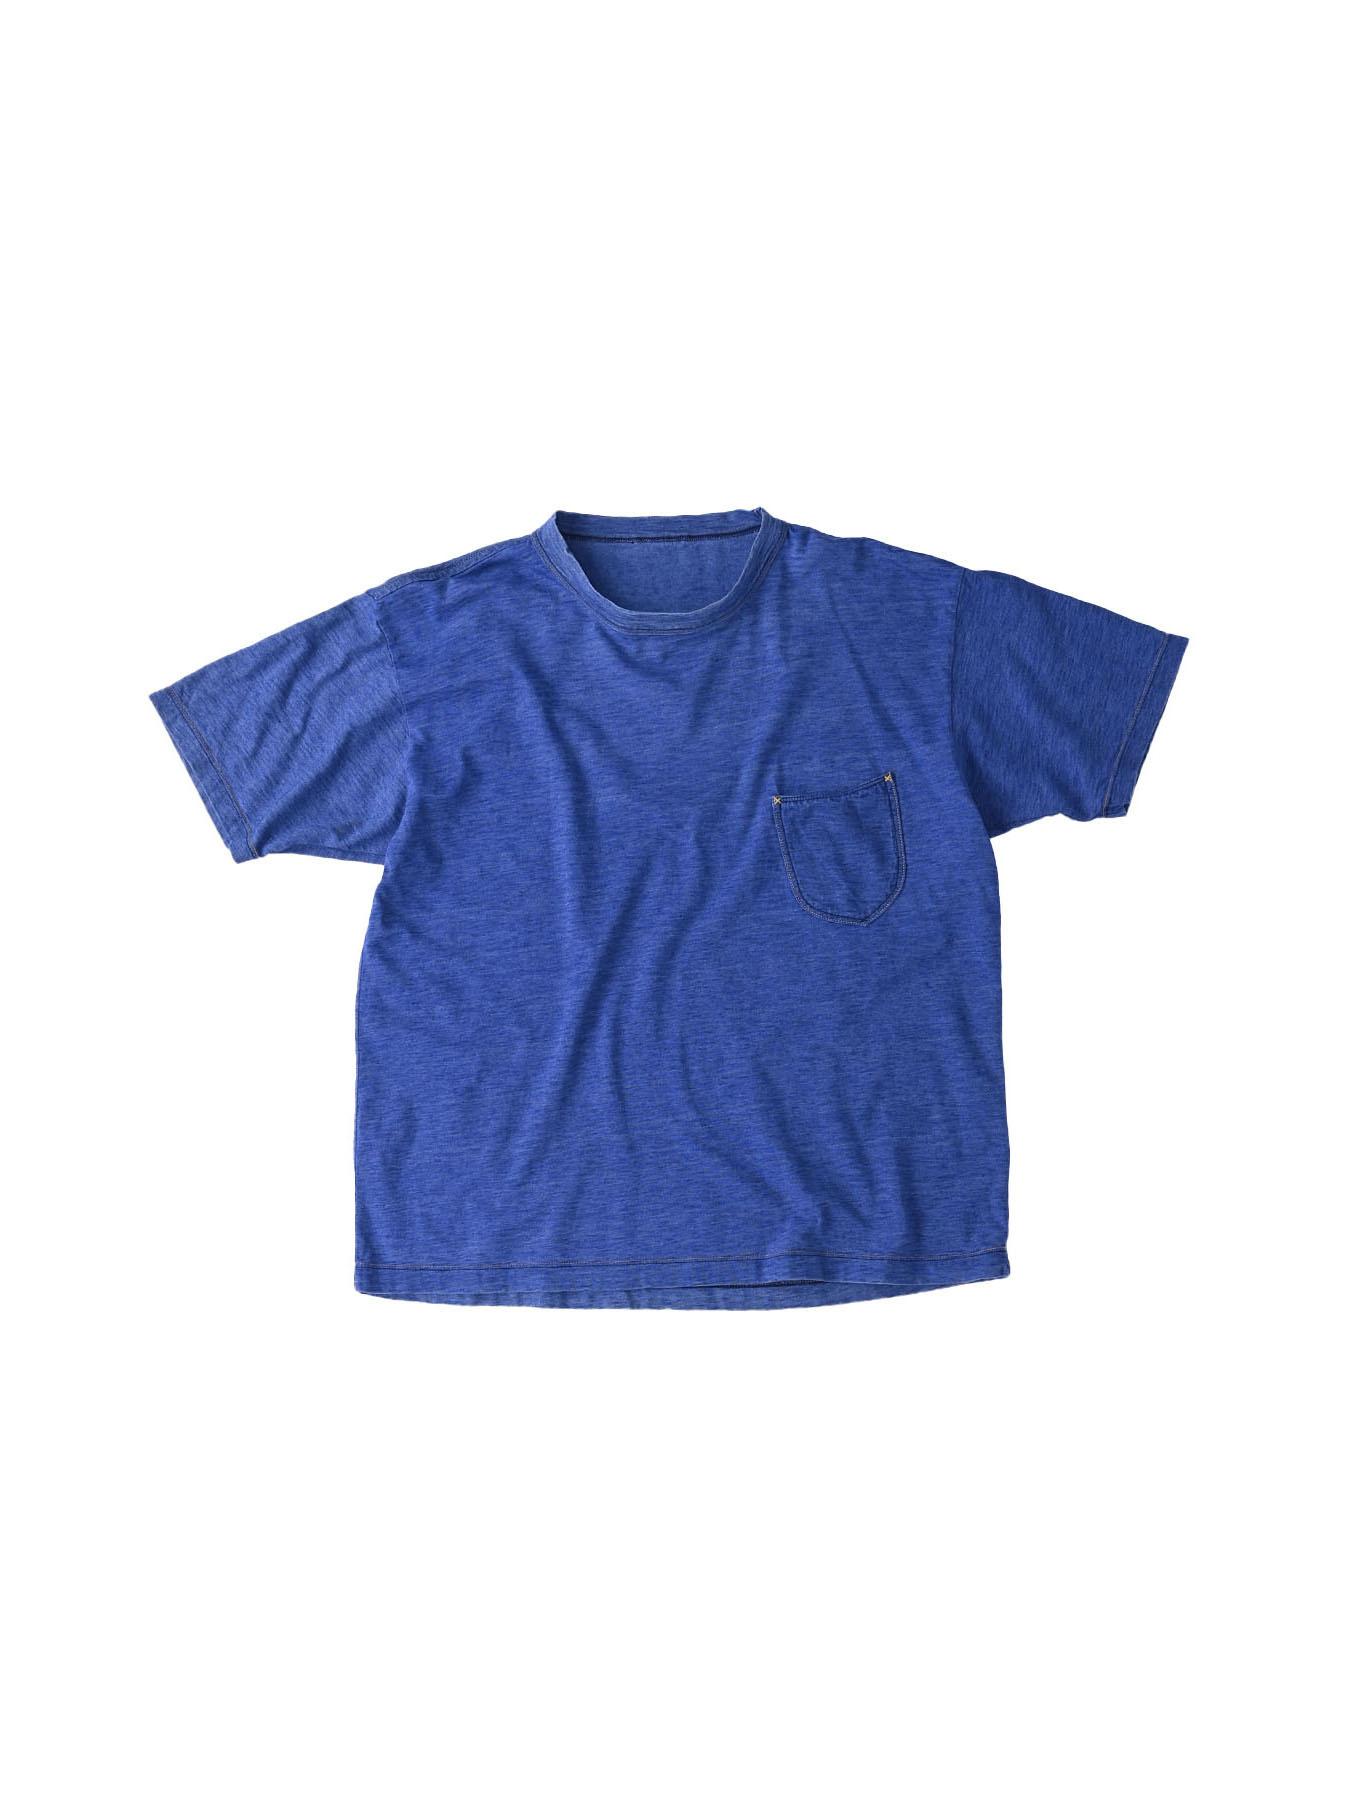 Distressed Indigo Tenjiku 908 Ocean T-Shirt (0621)-1